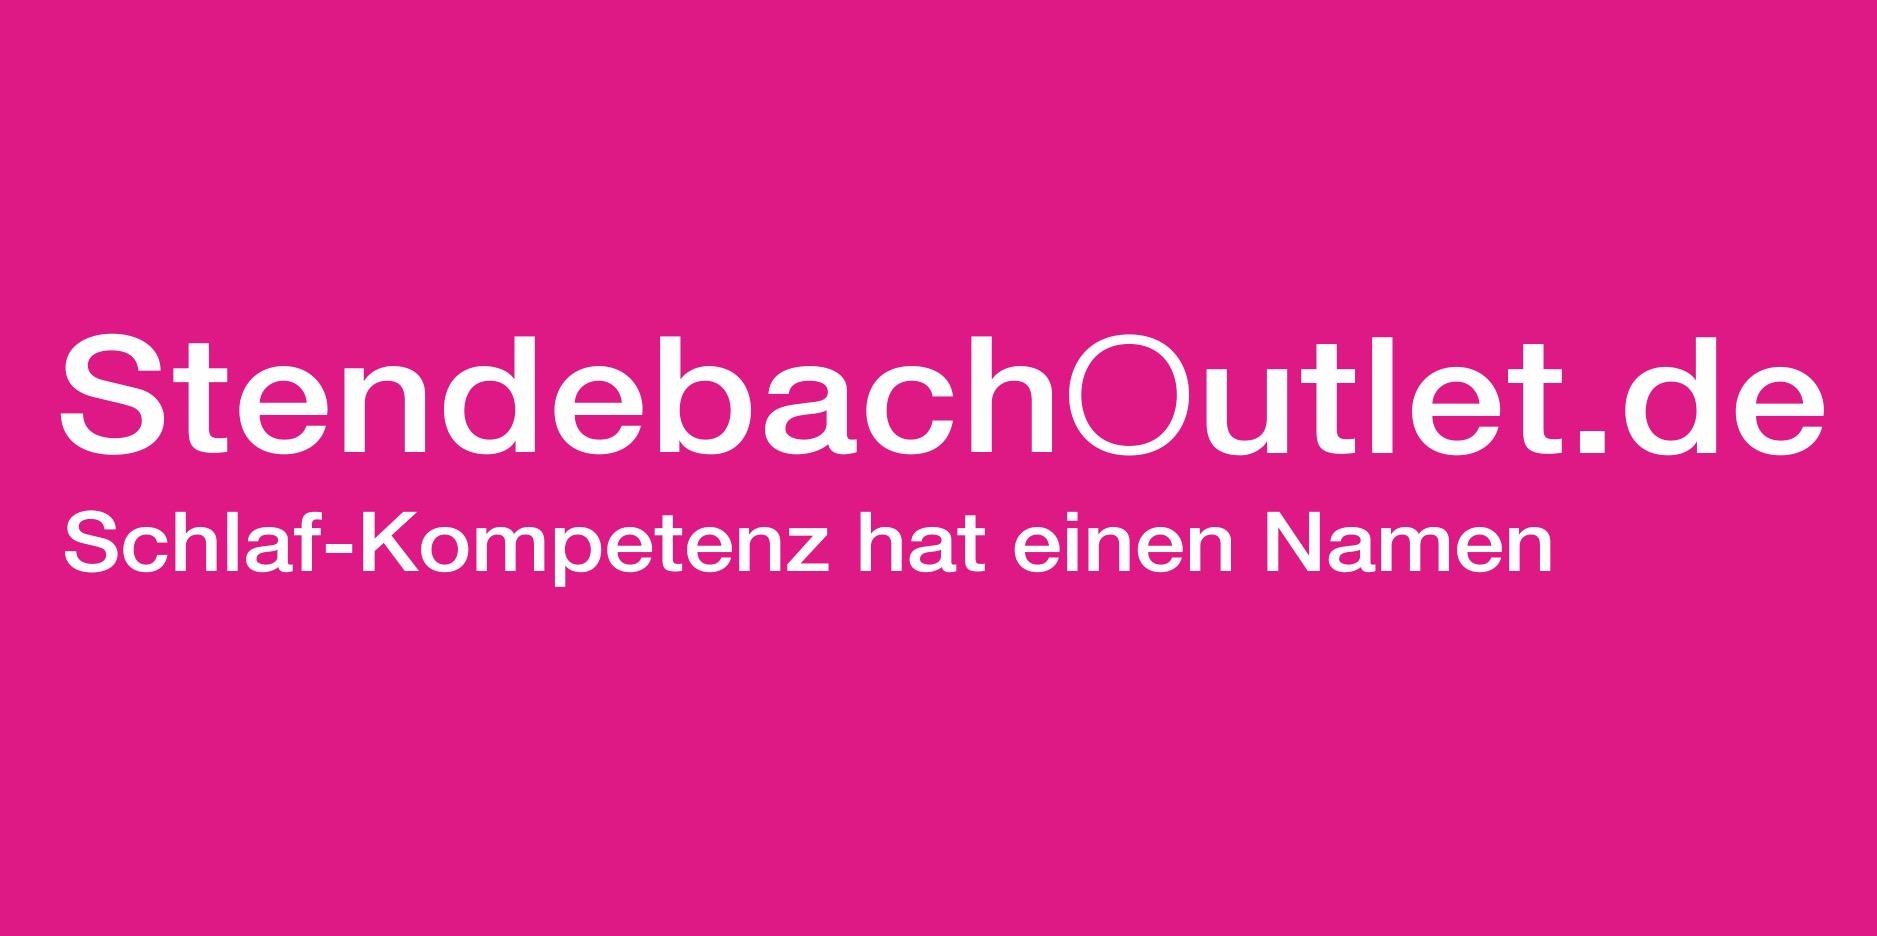 StendebachOutlet